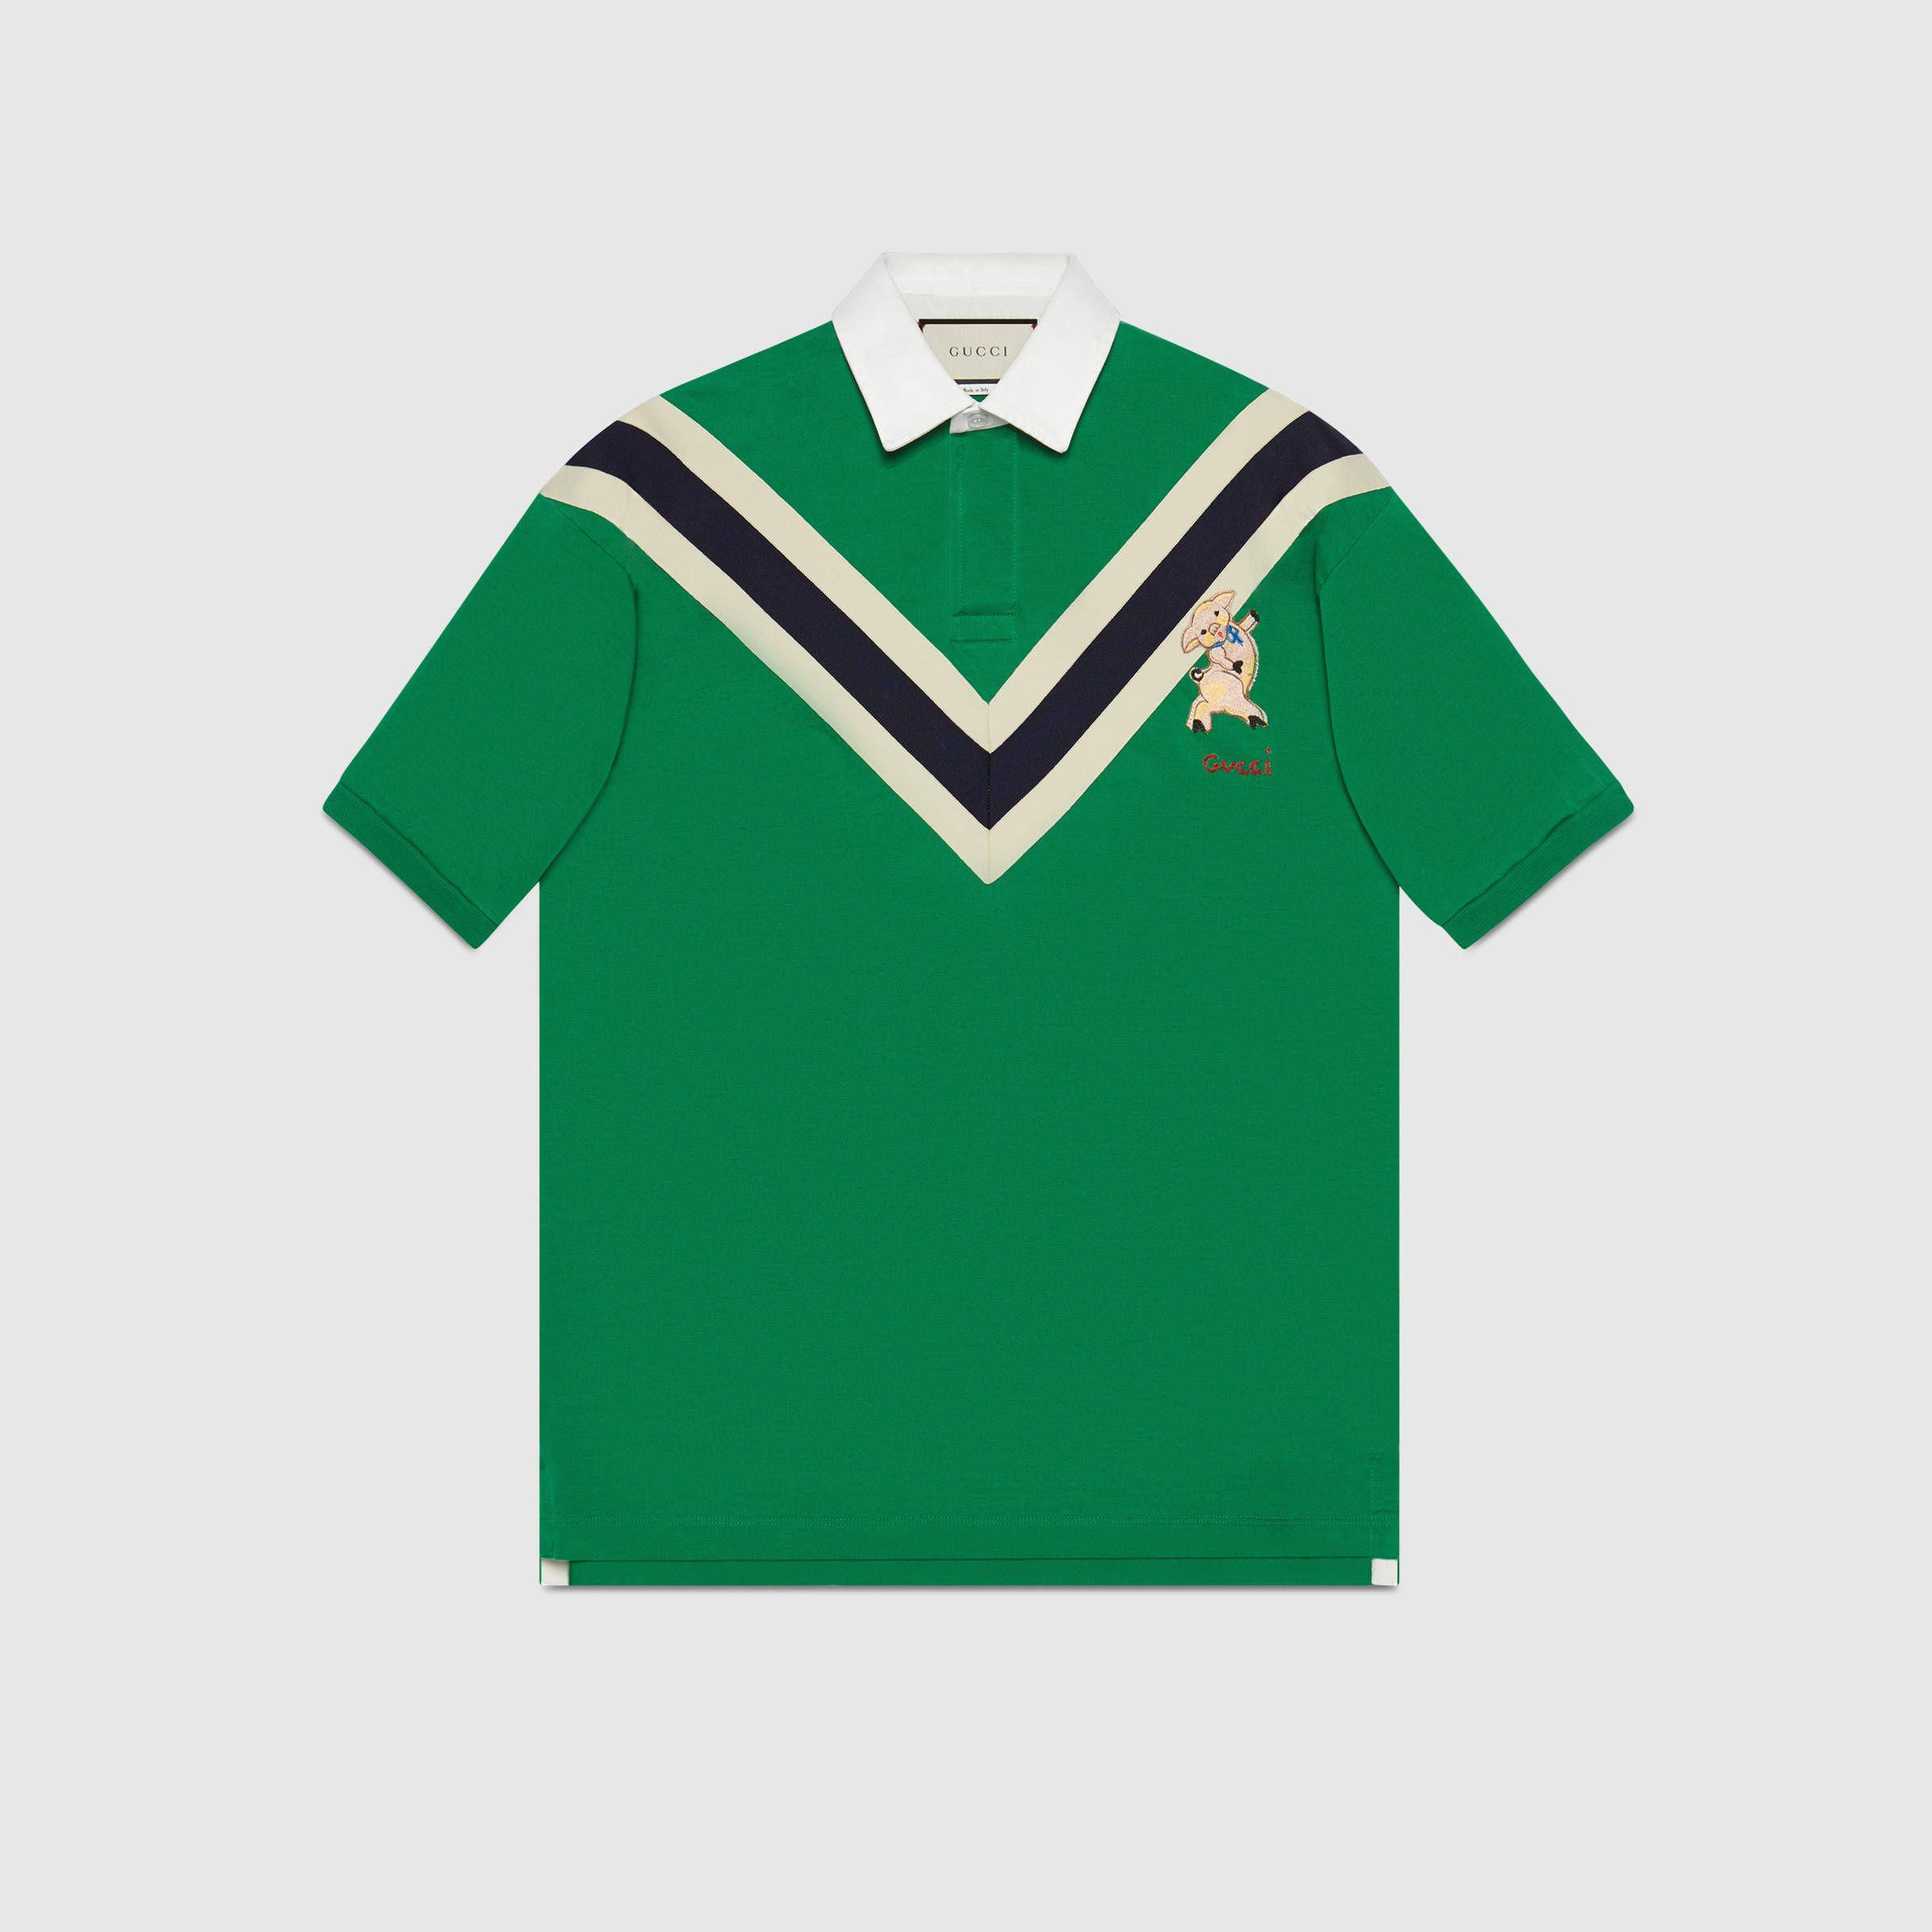 88a3f28d7 Chevron polo with piglet - Gucci Men s T-shirts   Polos 523055X9U383234